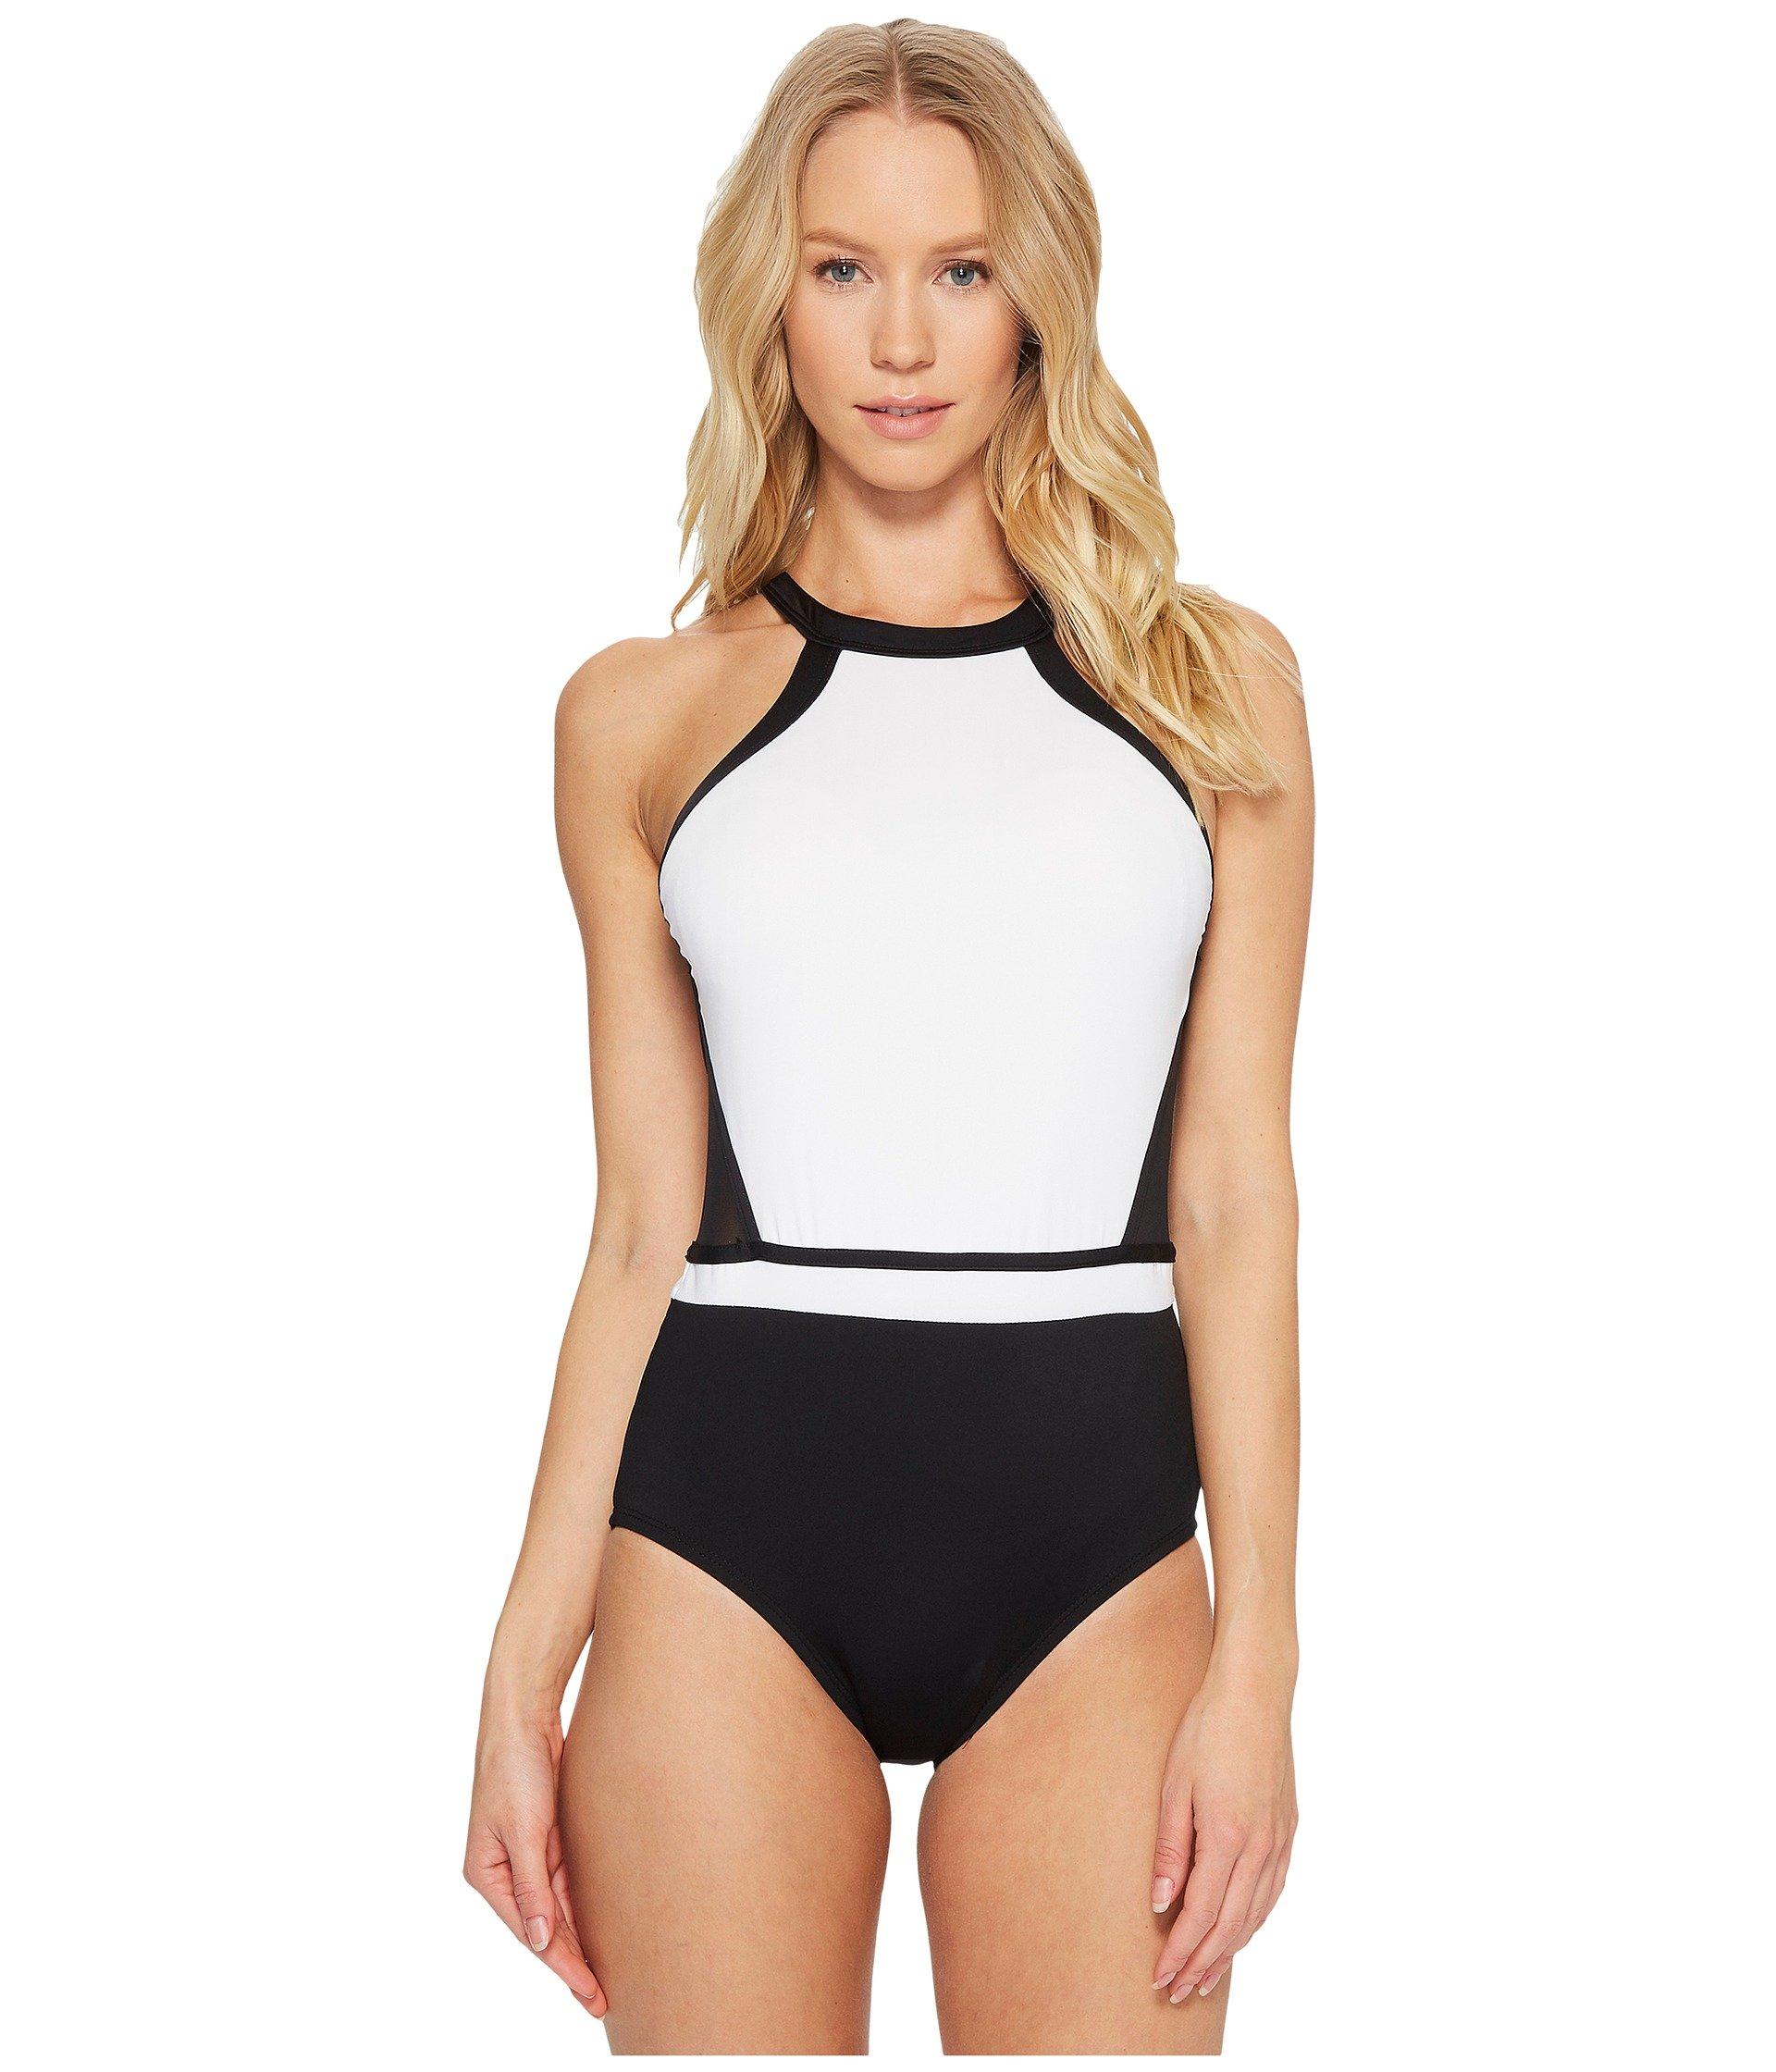 Jantzen Women's White High Neck H-Back One Piece Swimsuit, Black, 10